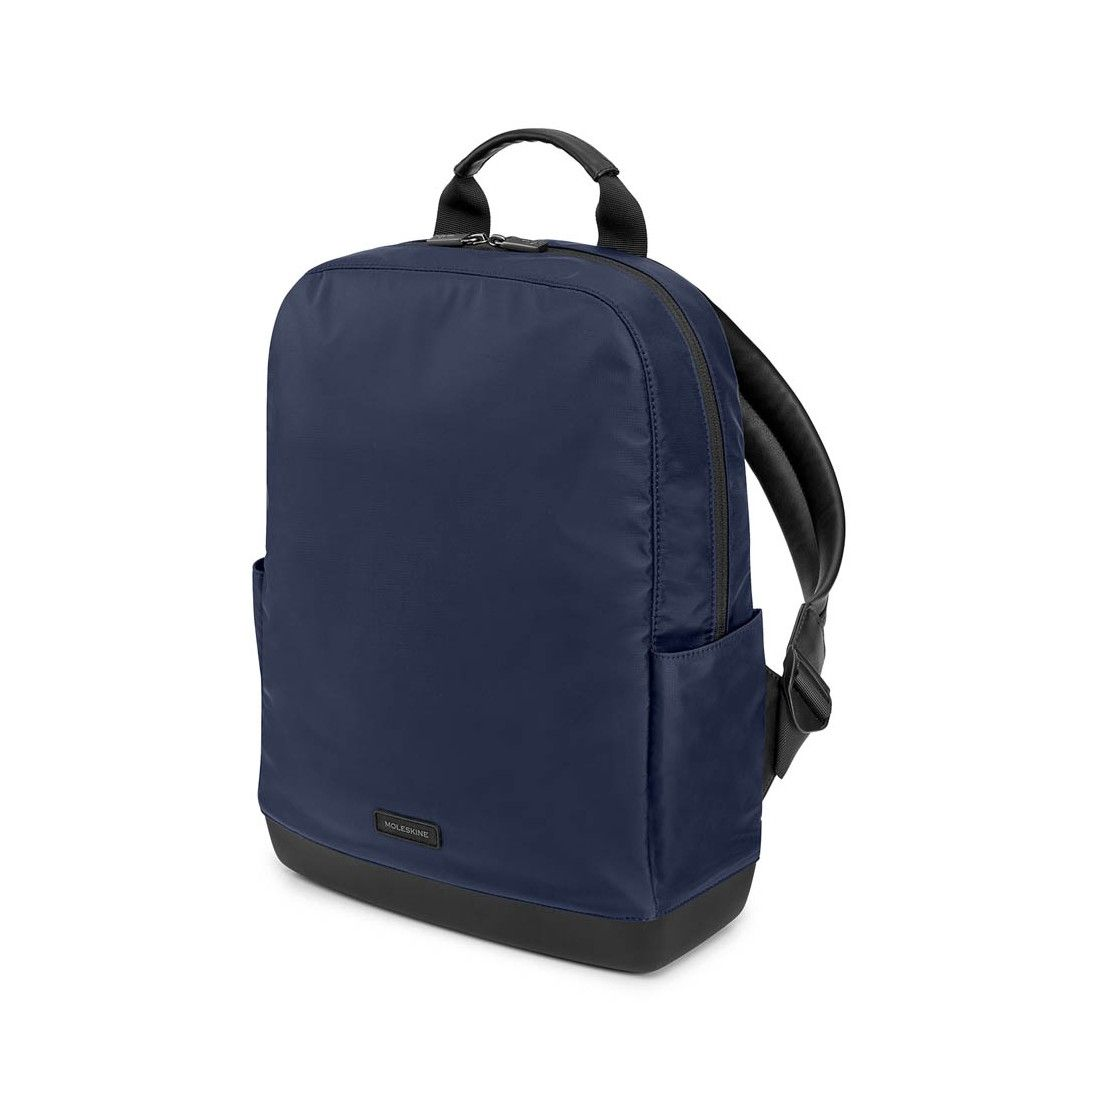 Mochila The Backpack - Nylon Ripstop...